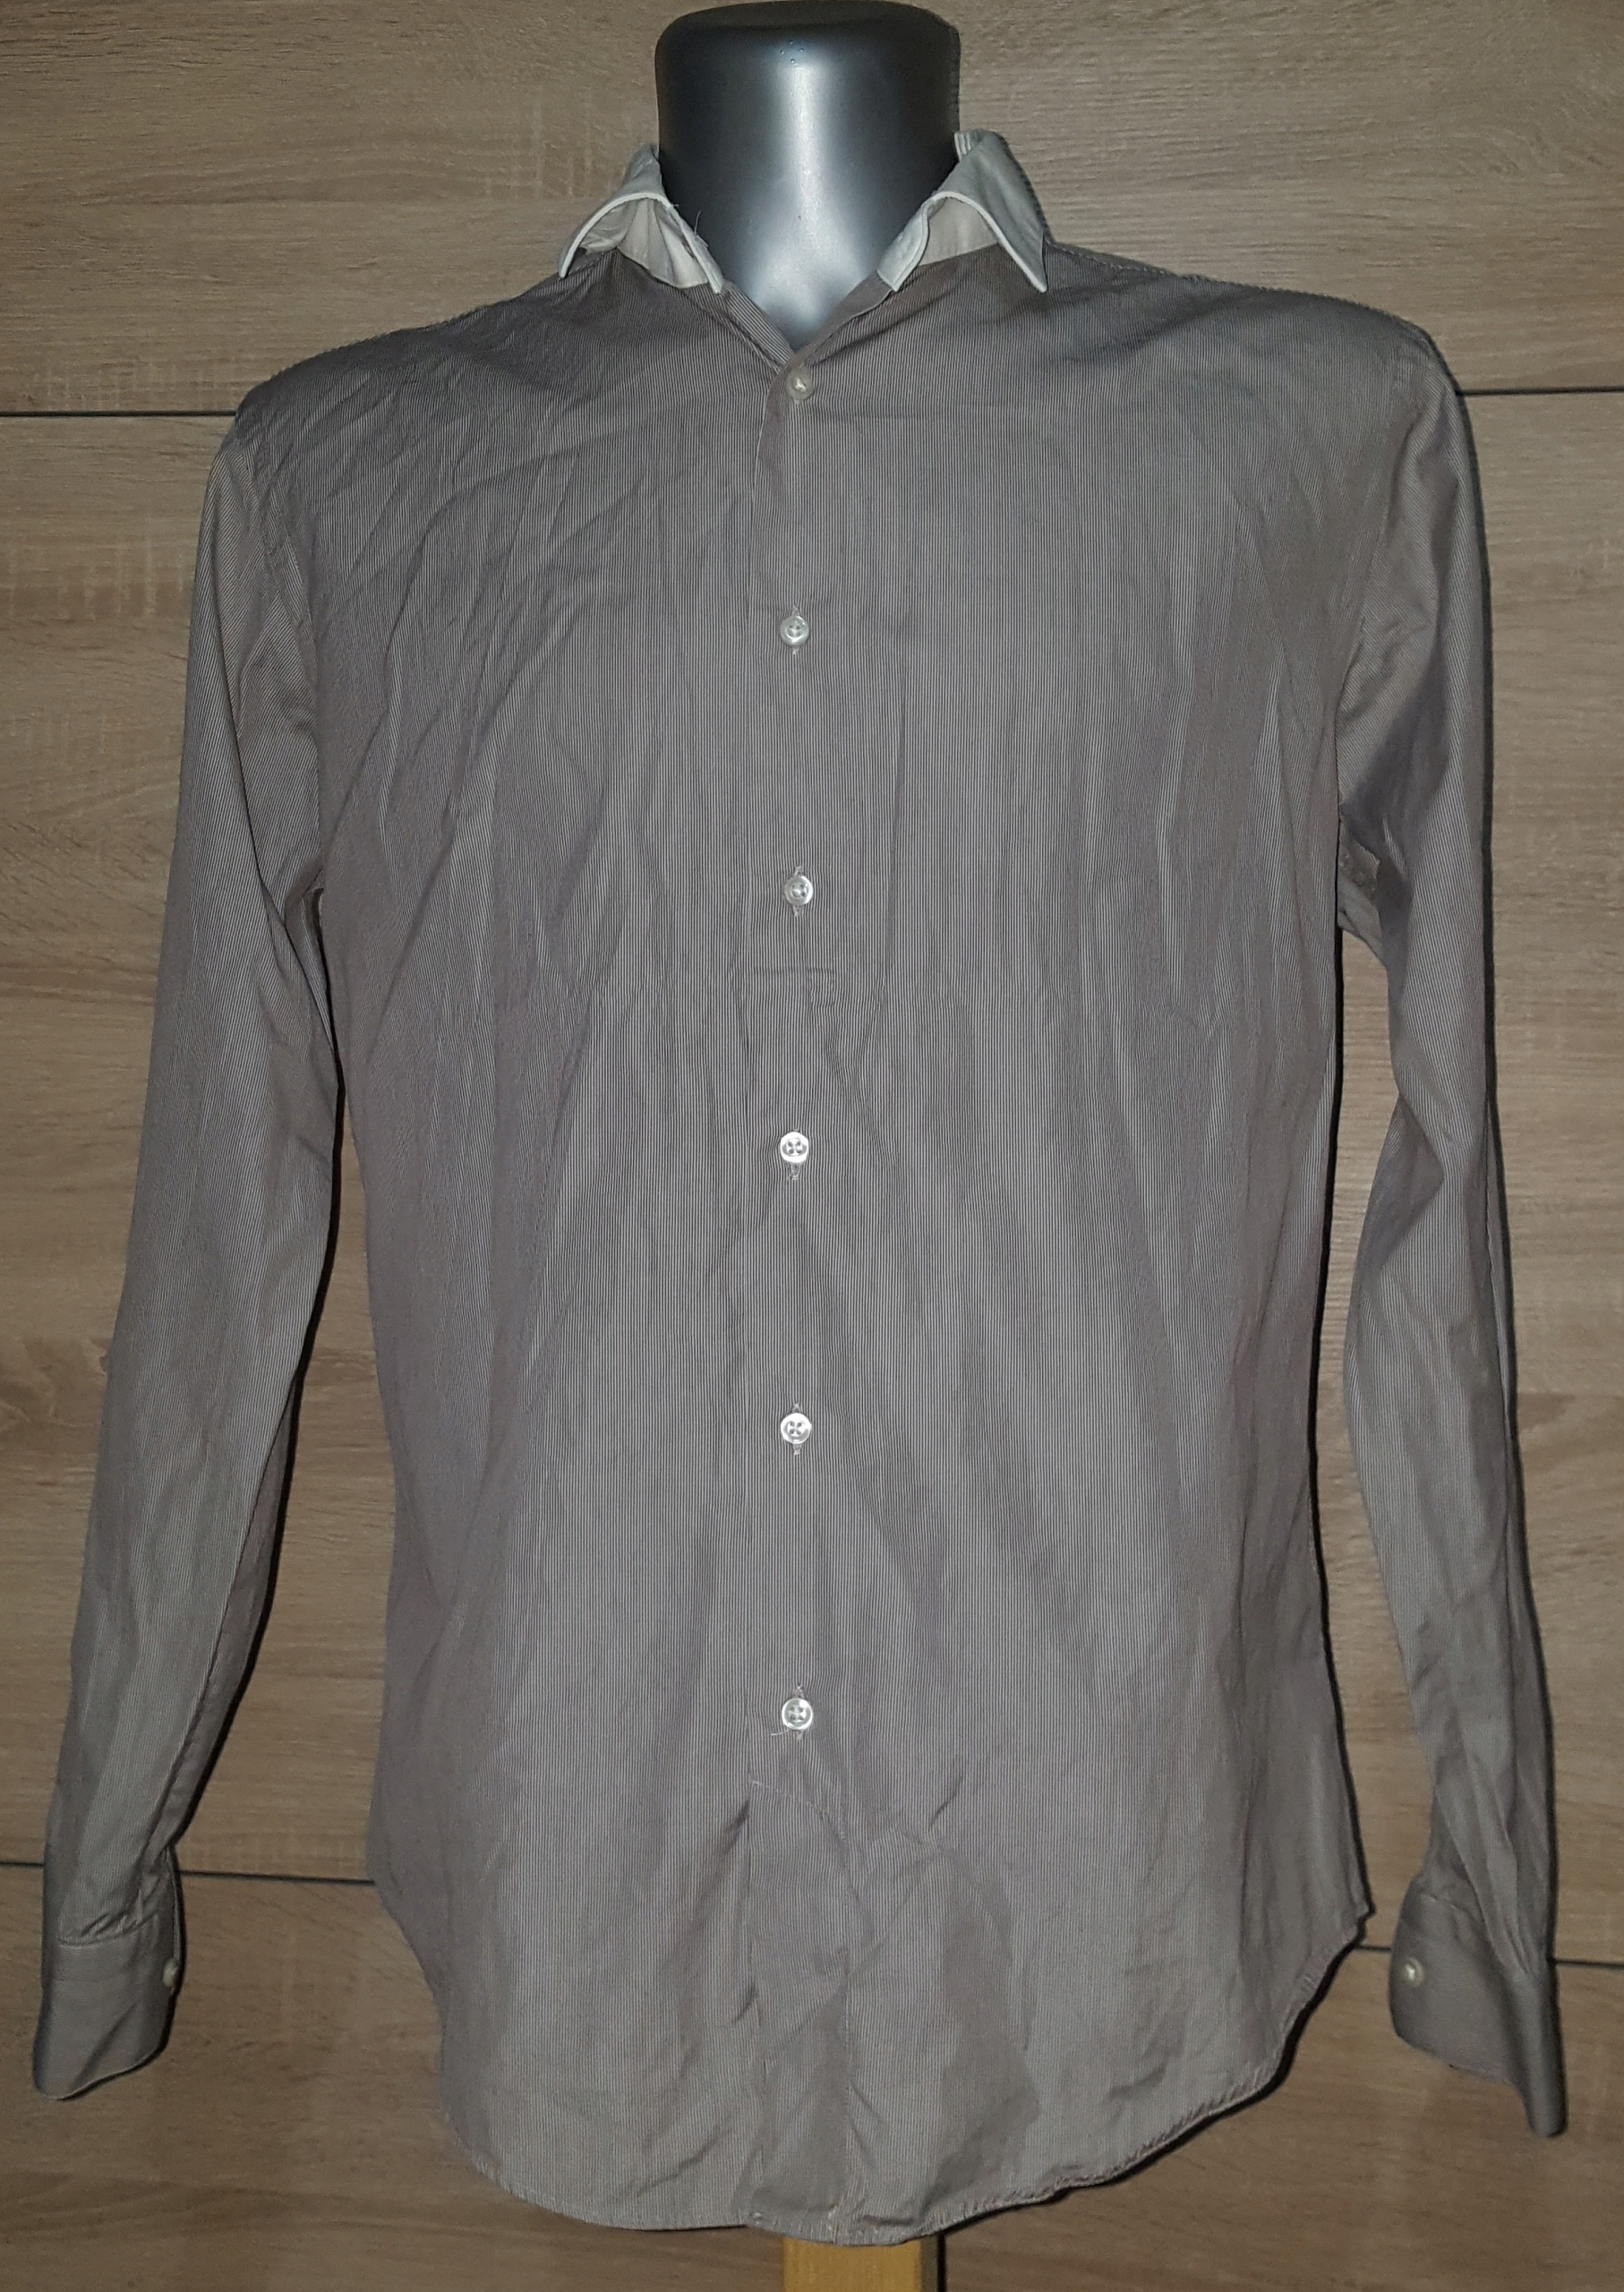 Koszula męska ZARA rozmiar L.